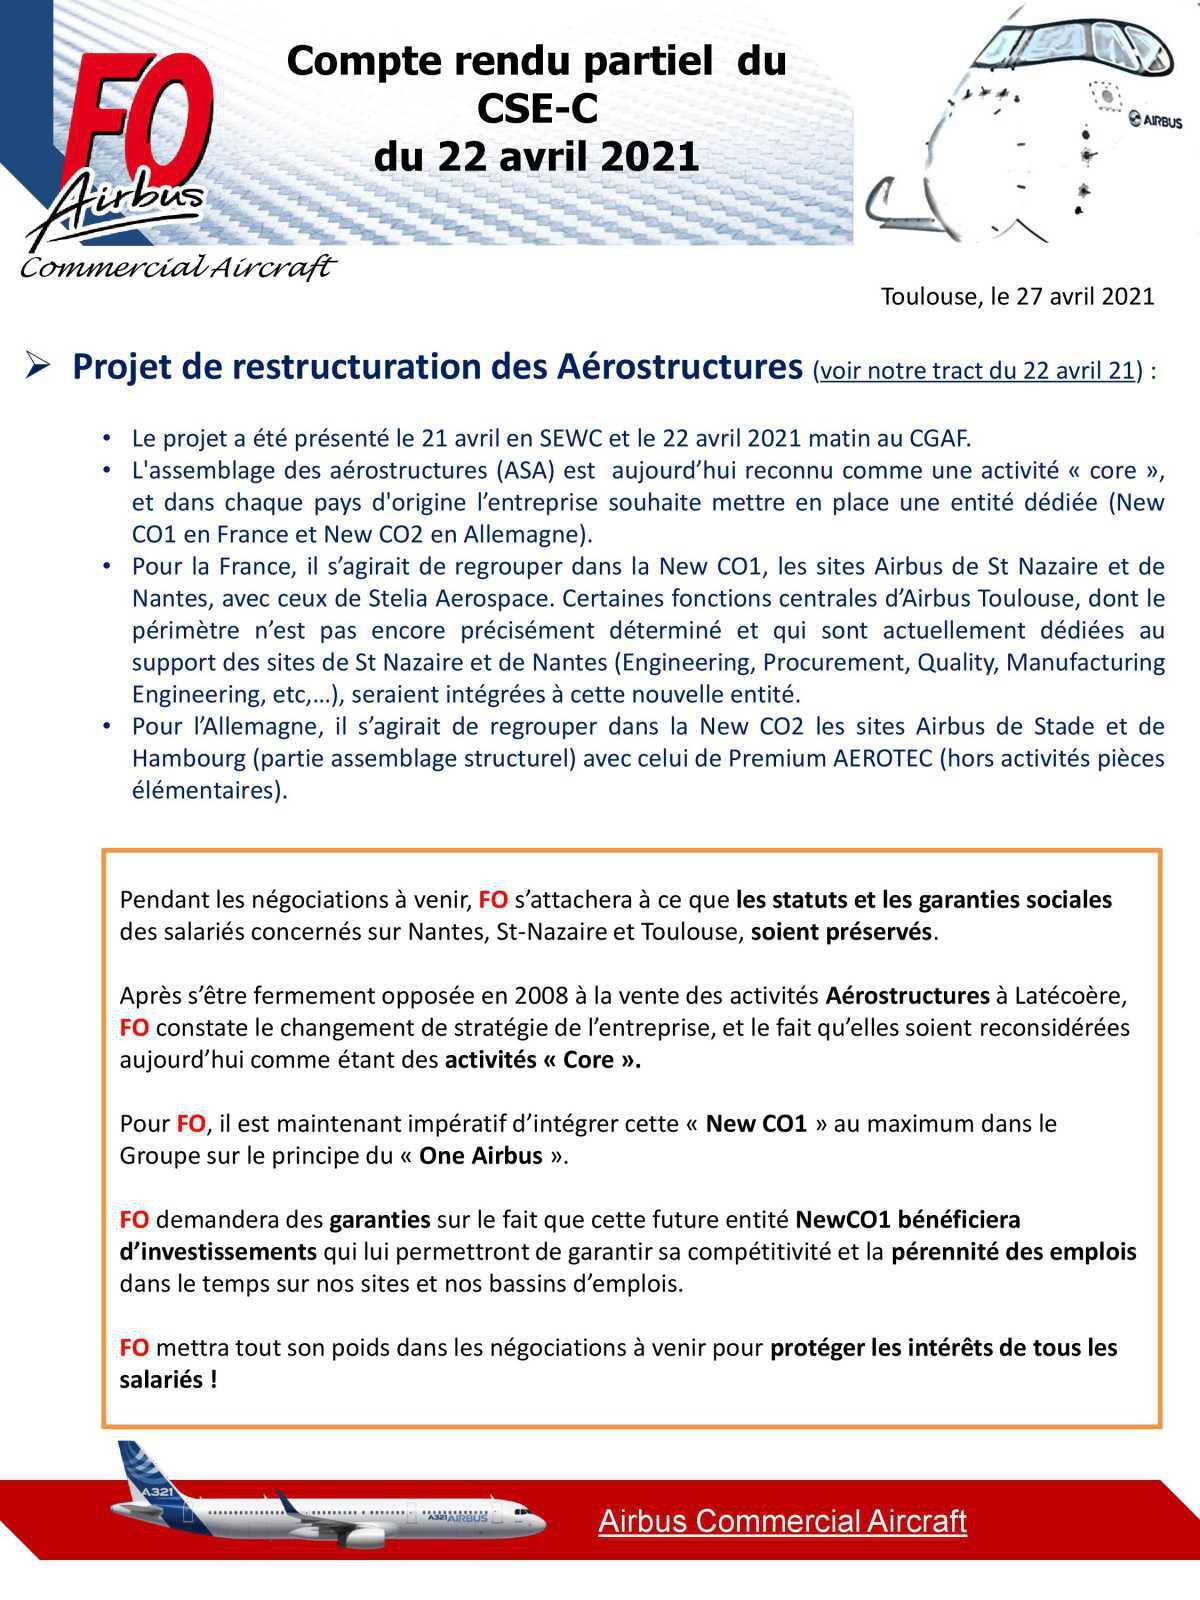 Compte rendu CSE-C du 22 Avril 2021